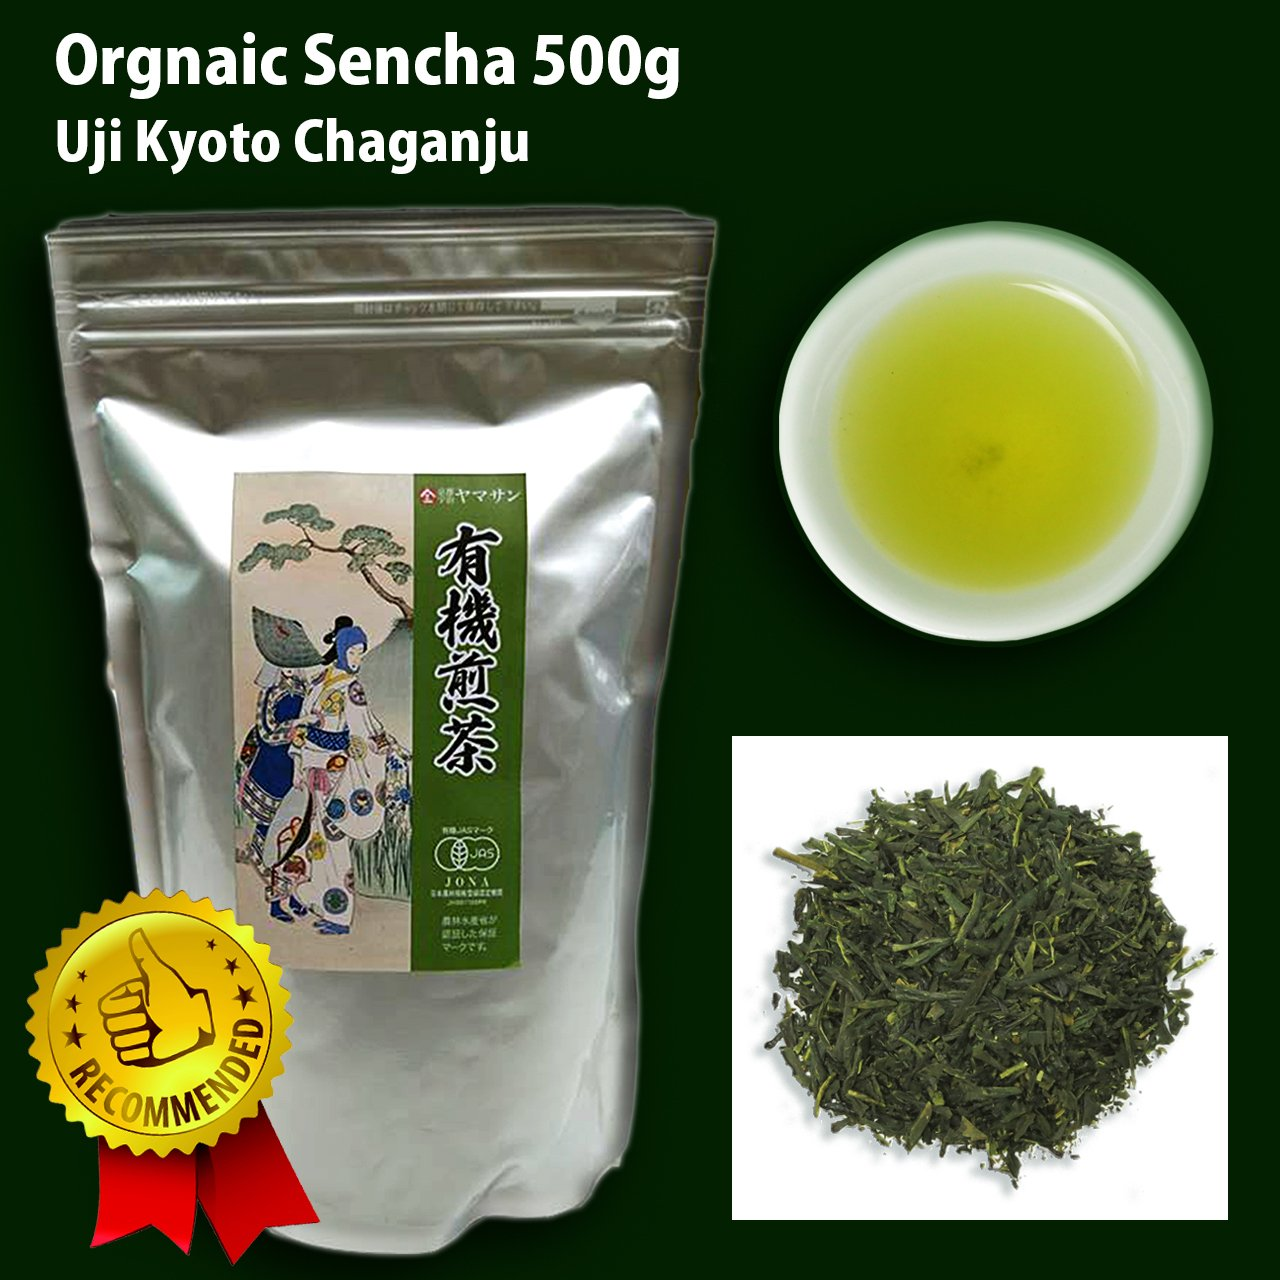 CHAGANJU- Uji Sencha Loose Leaf Green Tea, JAS Certified Organic, Japan, 500g Bag